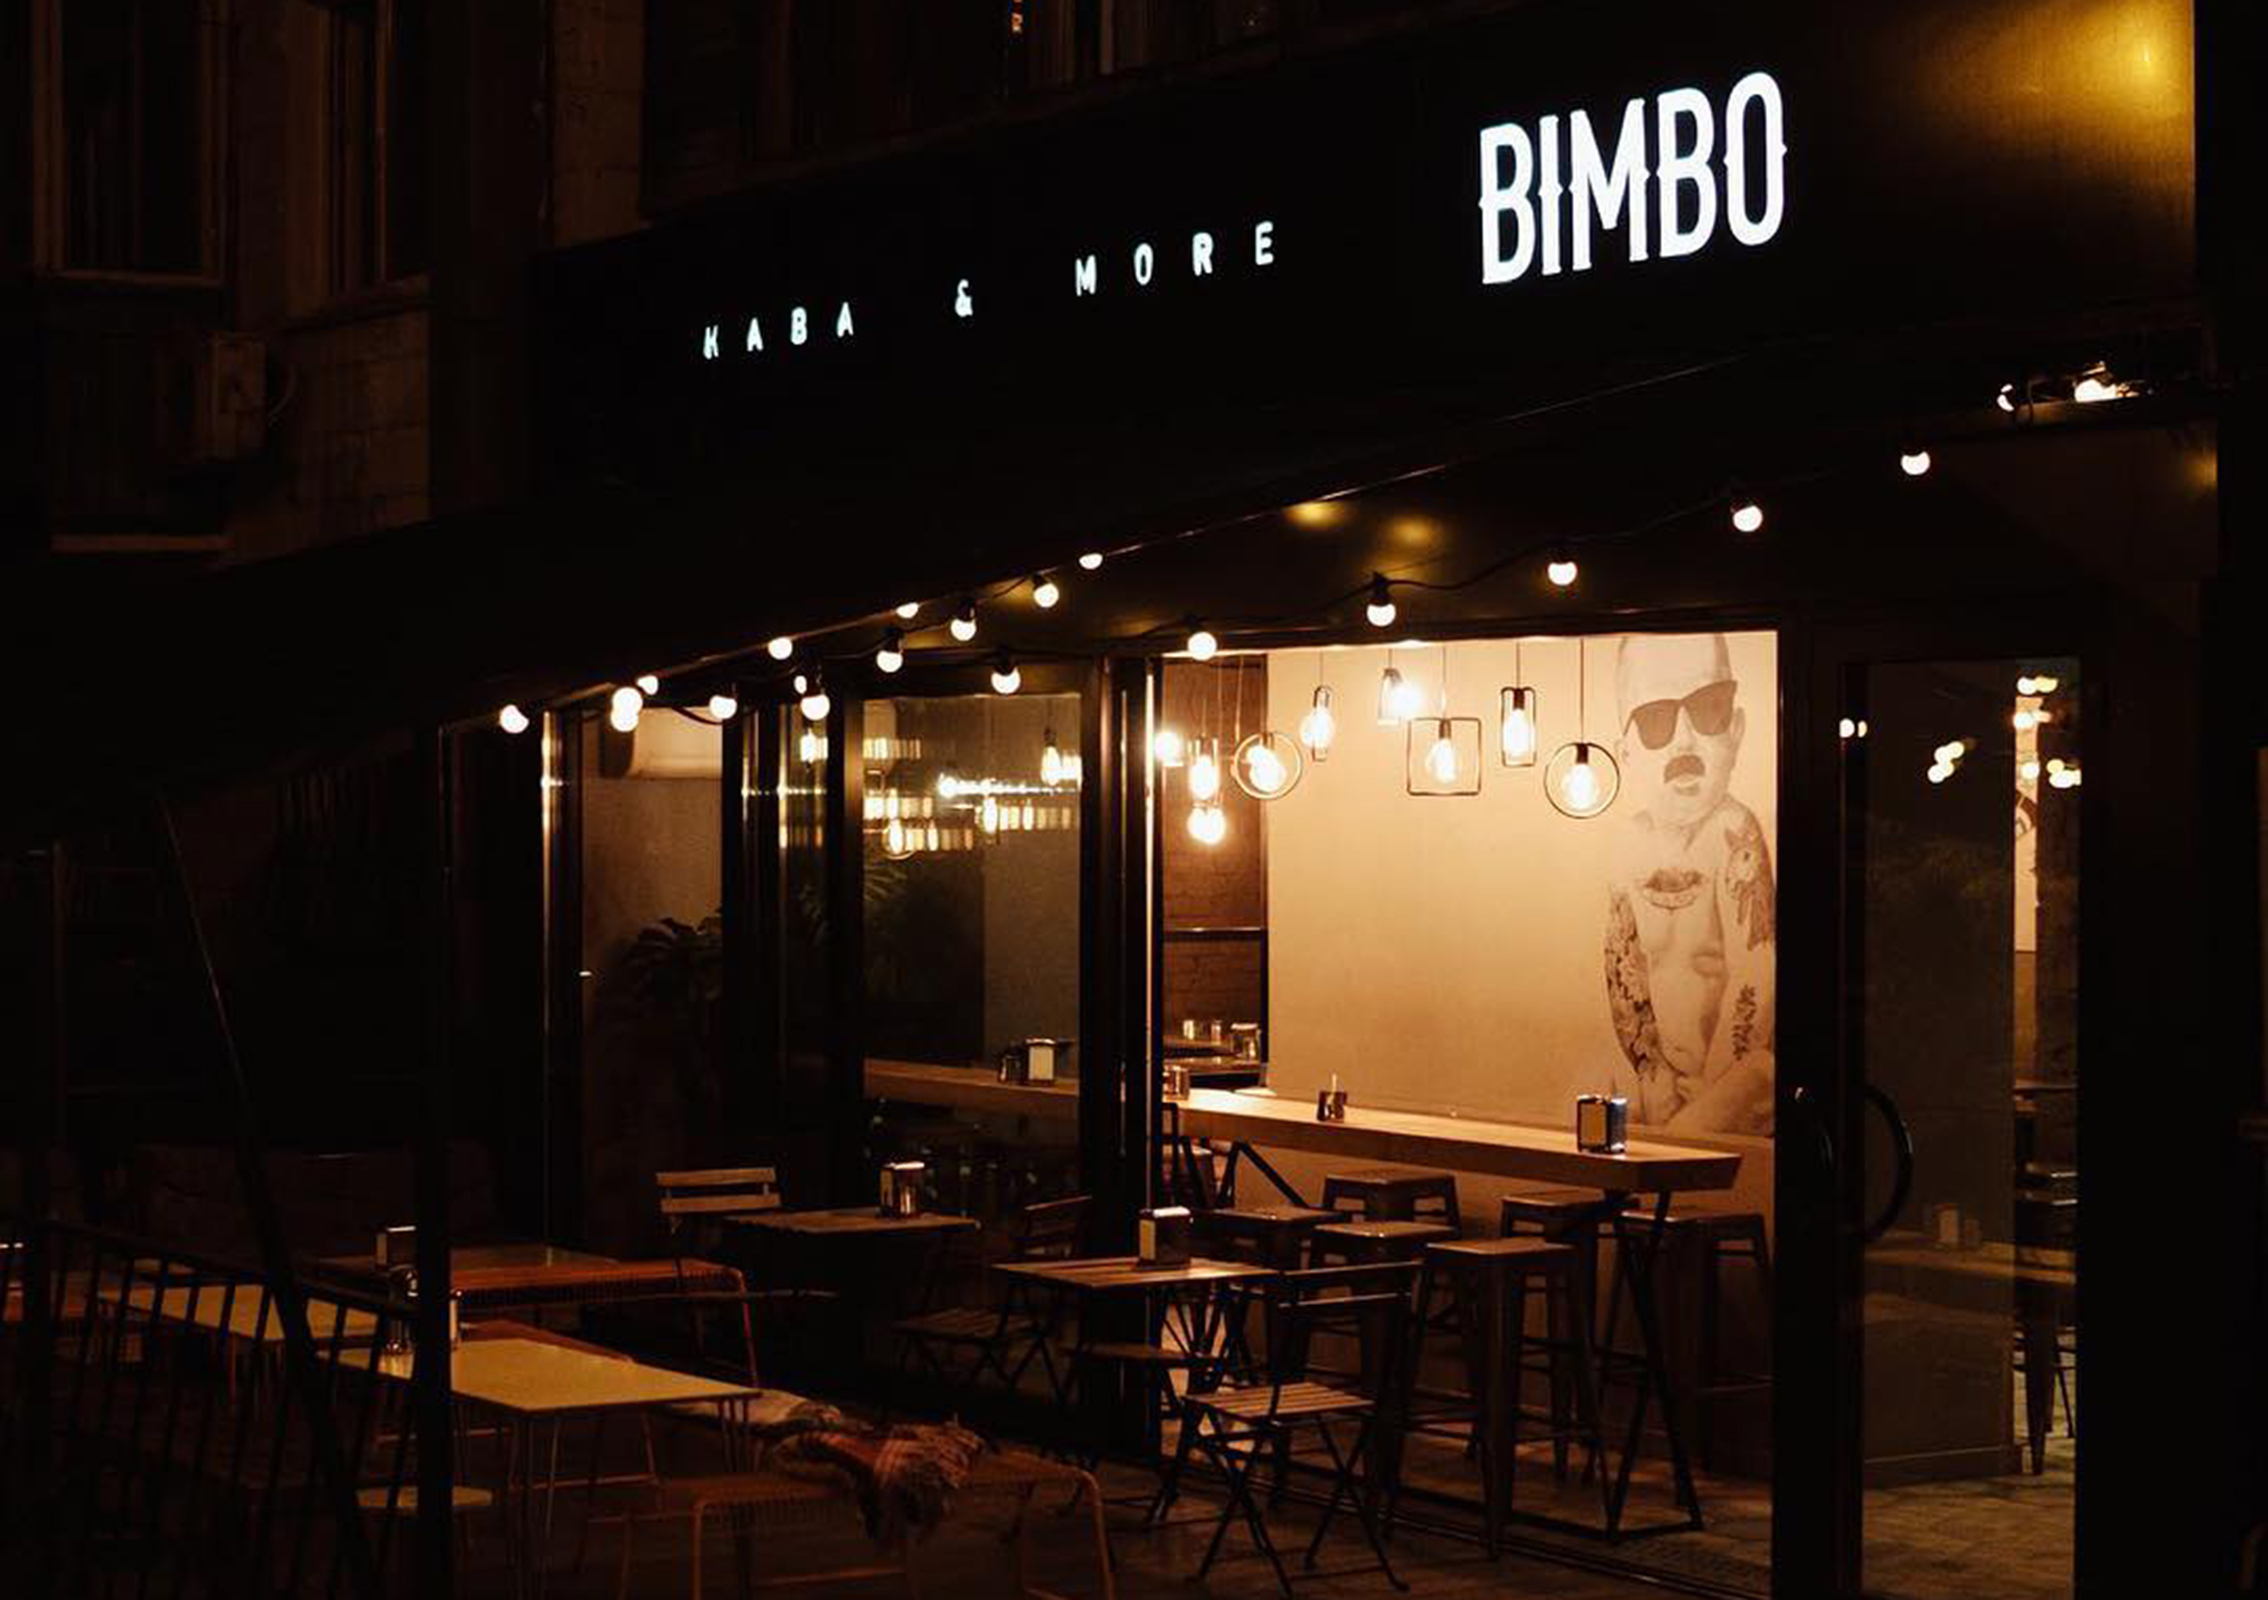 BIMBO кава & more